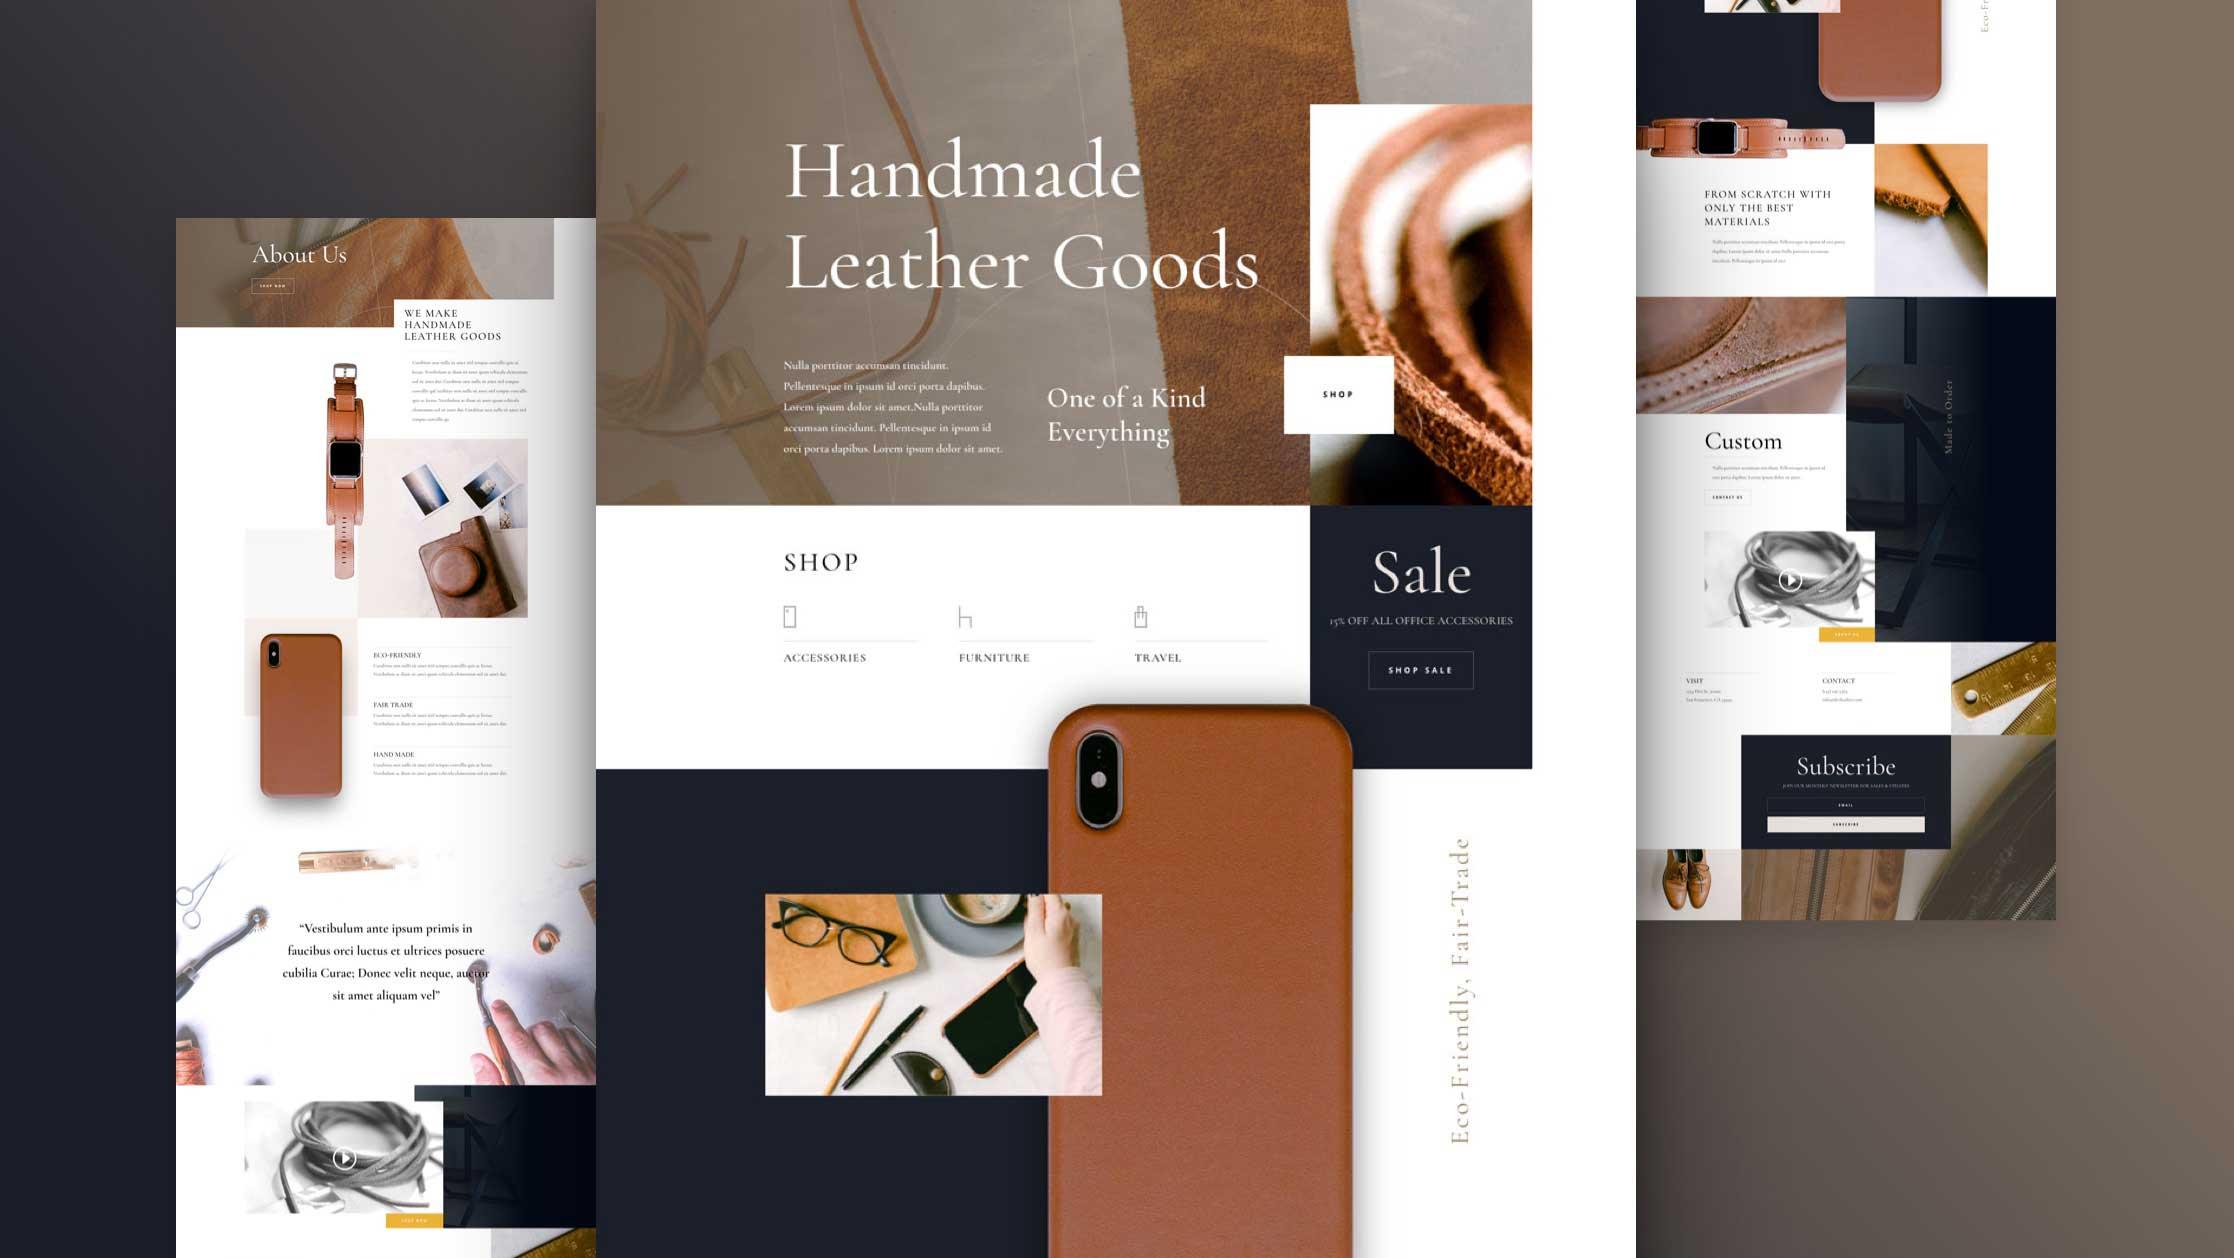 Handmade Goods Website